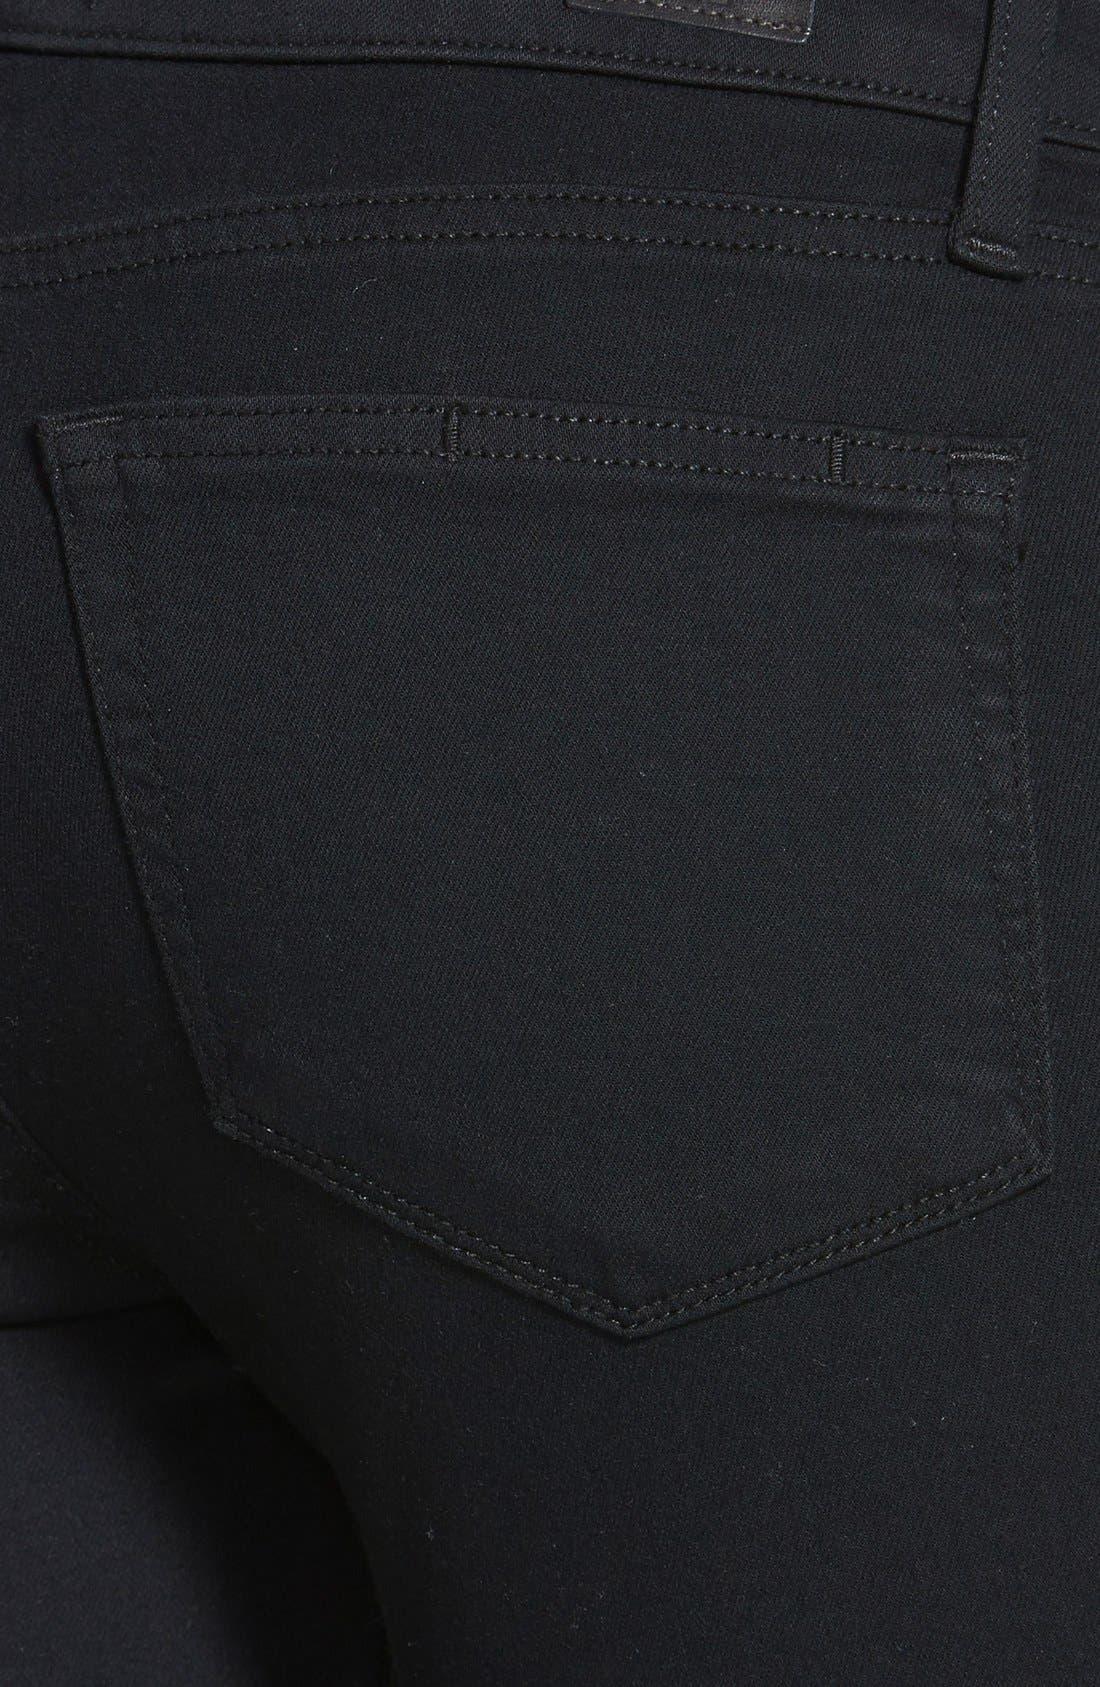 Alternate Image 3  - PAIGE 'Transcend - Verdugo' Ultra Skinny Jeans